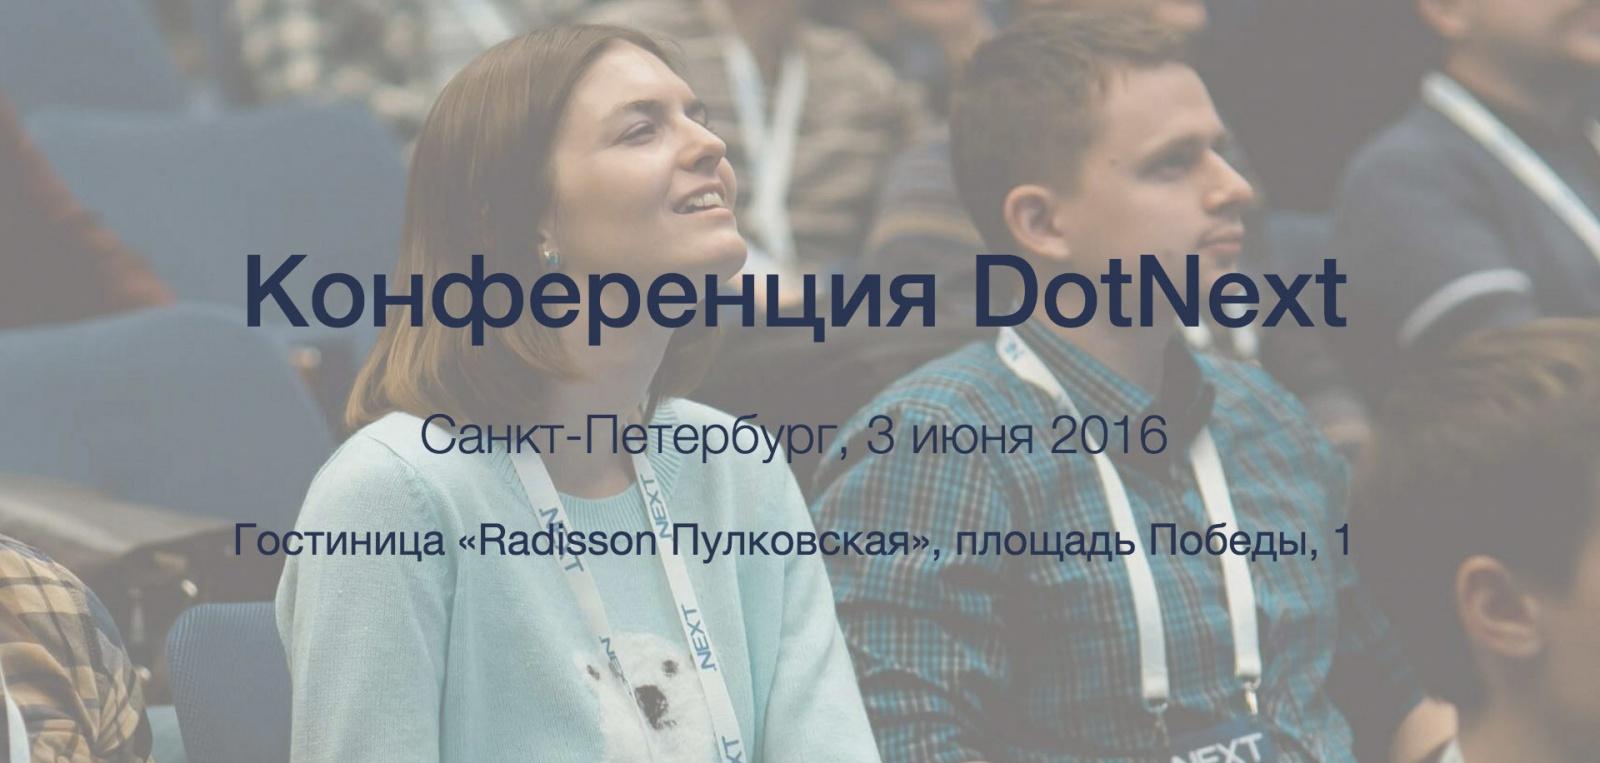 Анонс .NET-конференции DotNext 2016 Piter - 1